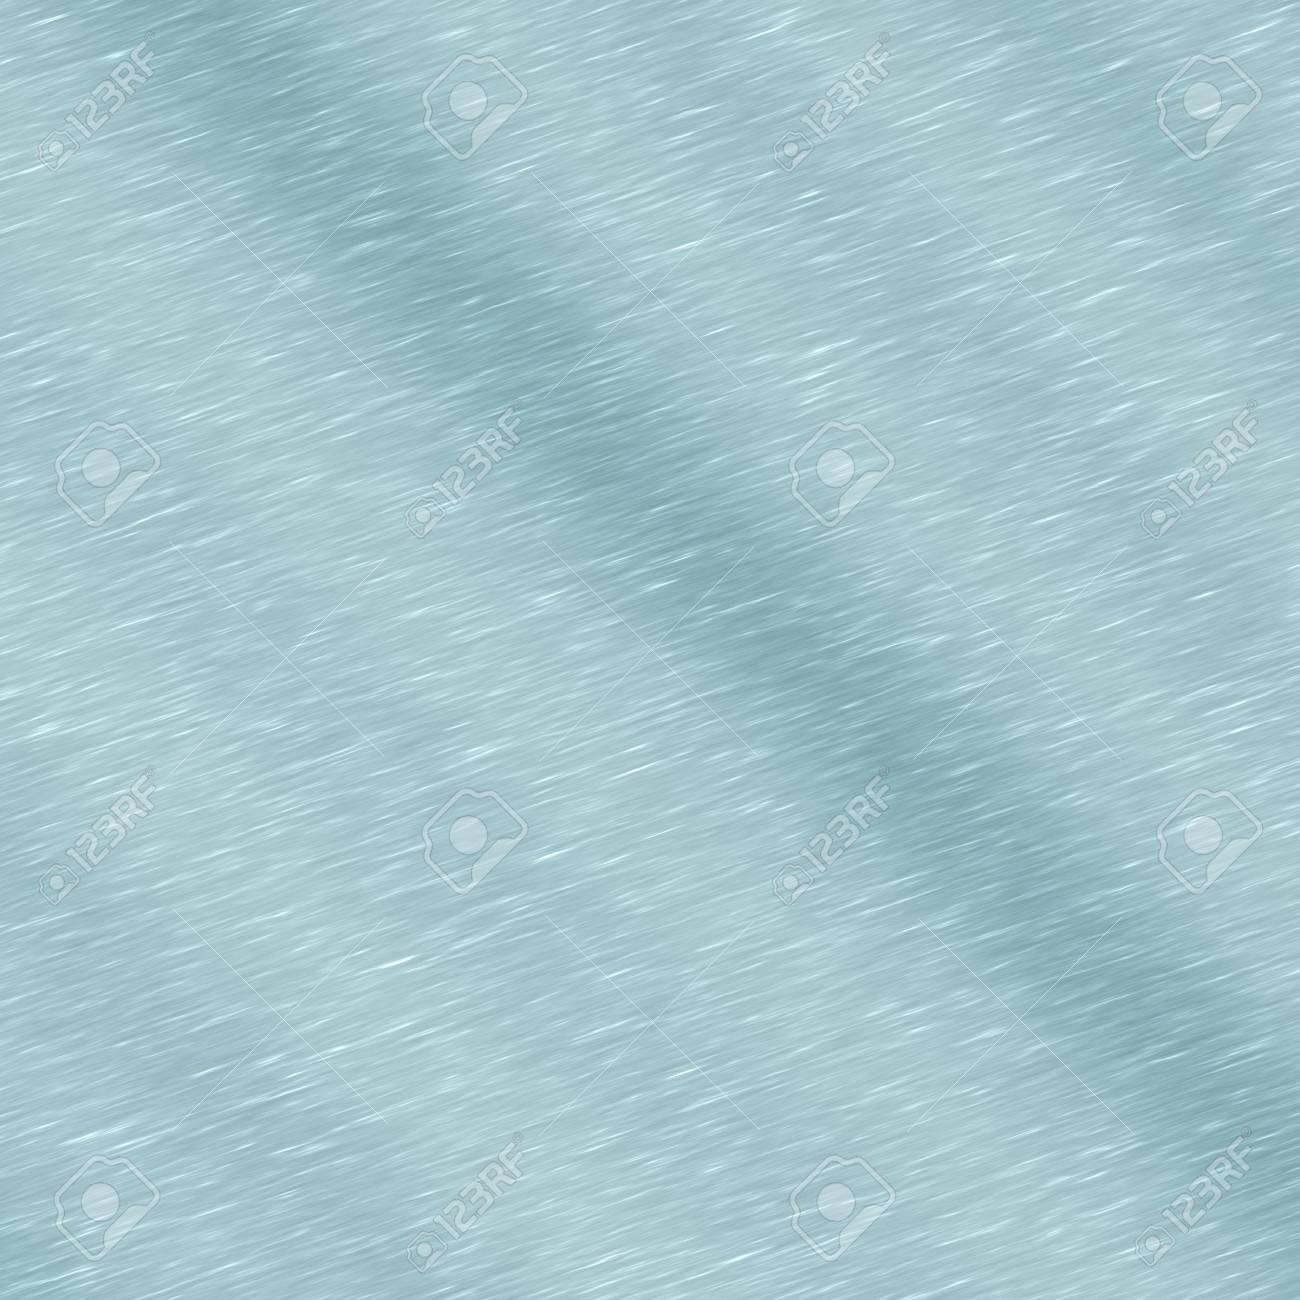 Brushed metal surface texture seamless background illustration Stock Illustration - 3419141